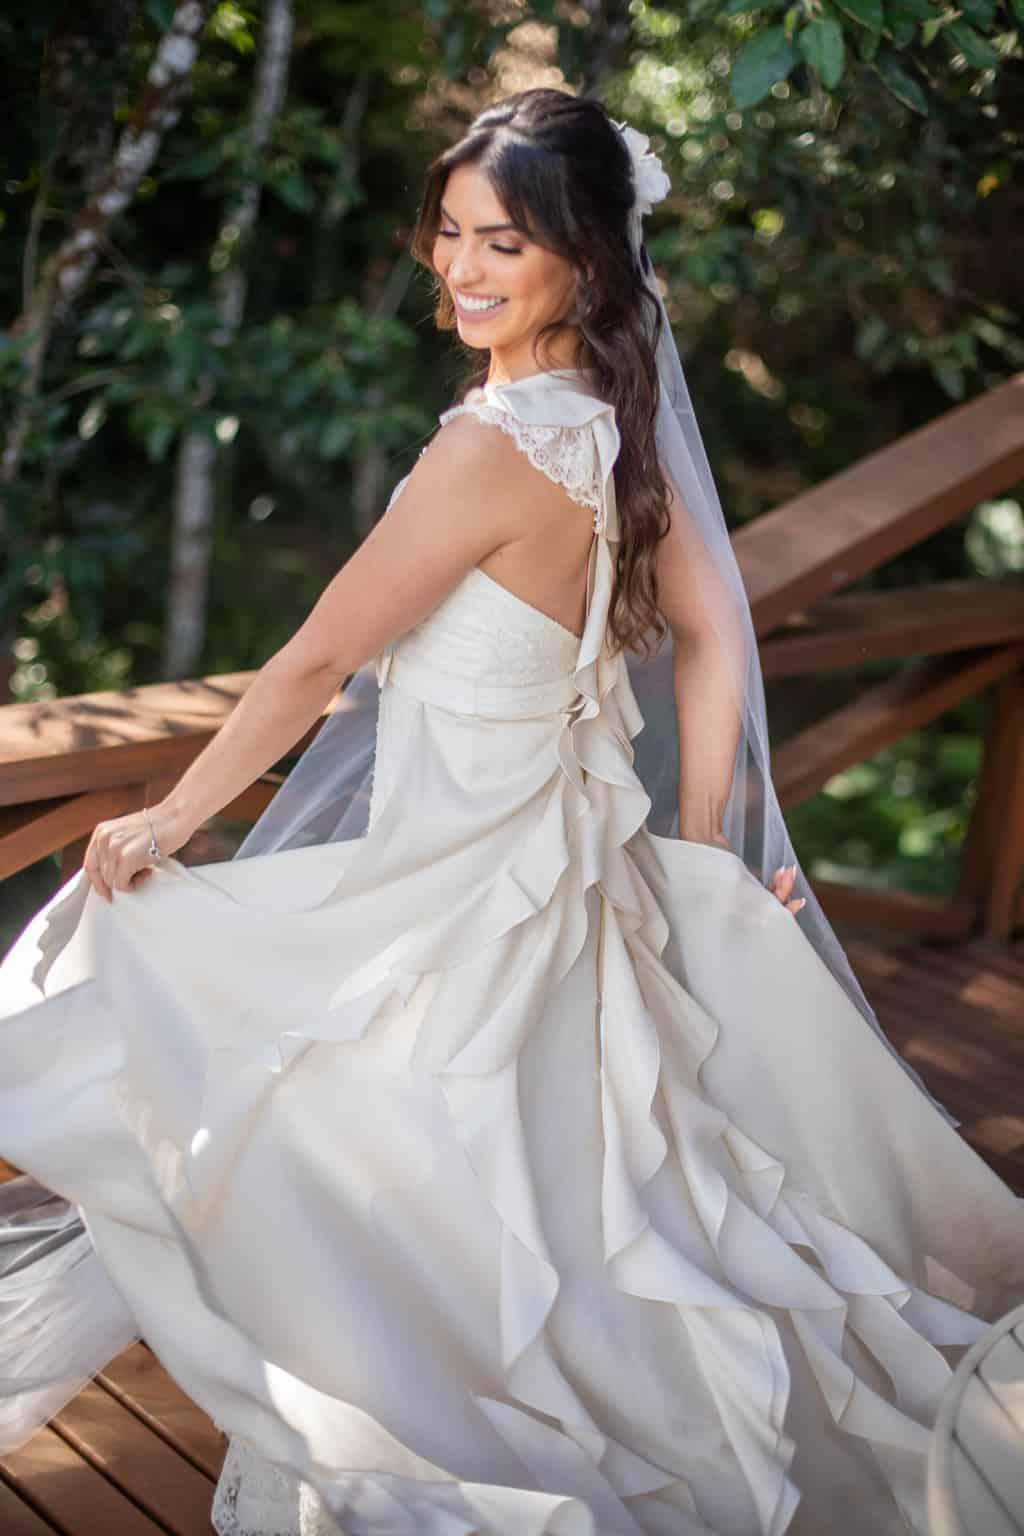 beleza-da-noiva-Casamento-Juliana-e-Sebastian-making-of-Pousada-La-Belle-Bruna-vestido-de-noiva107-1